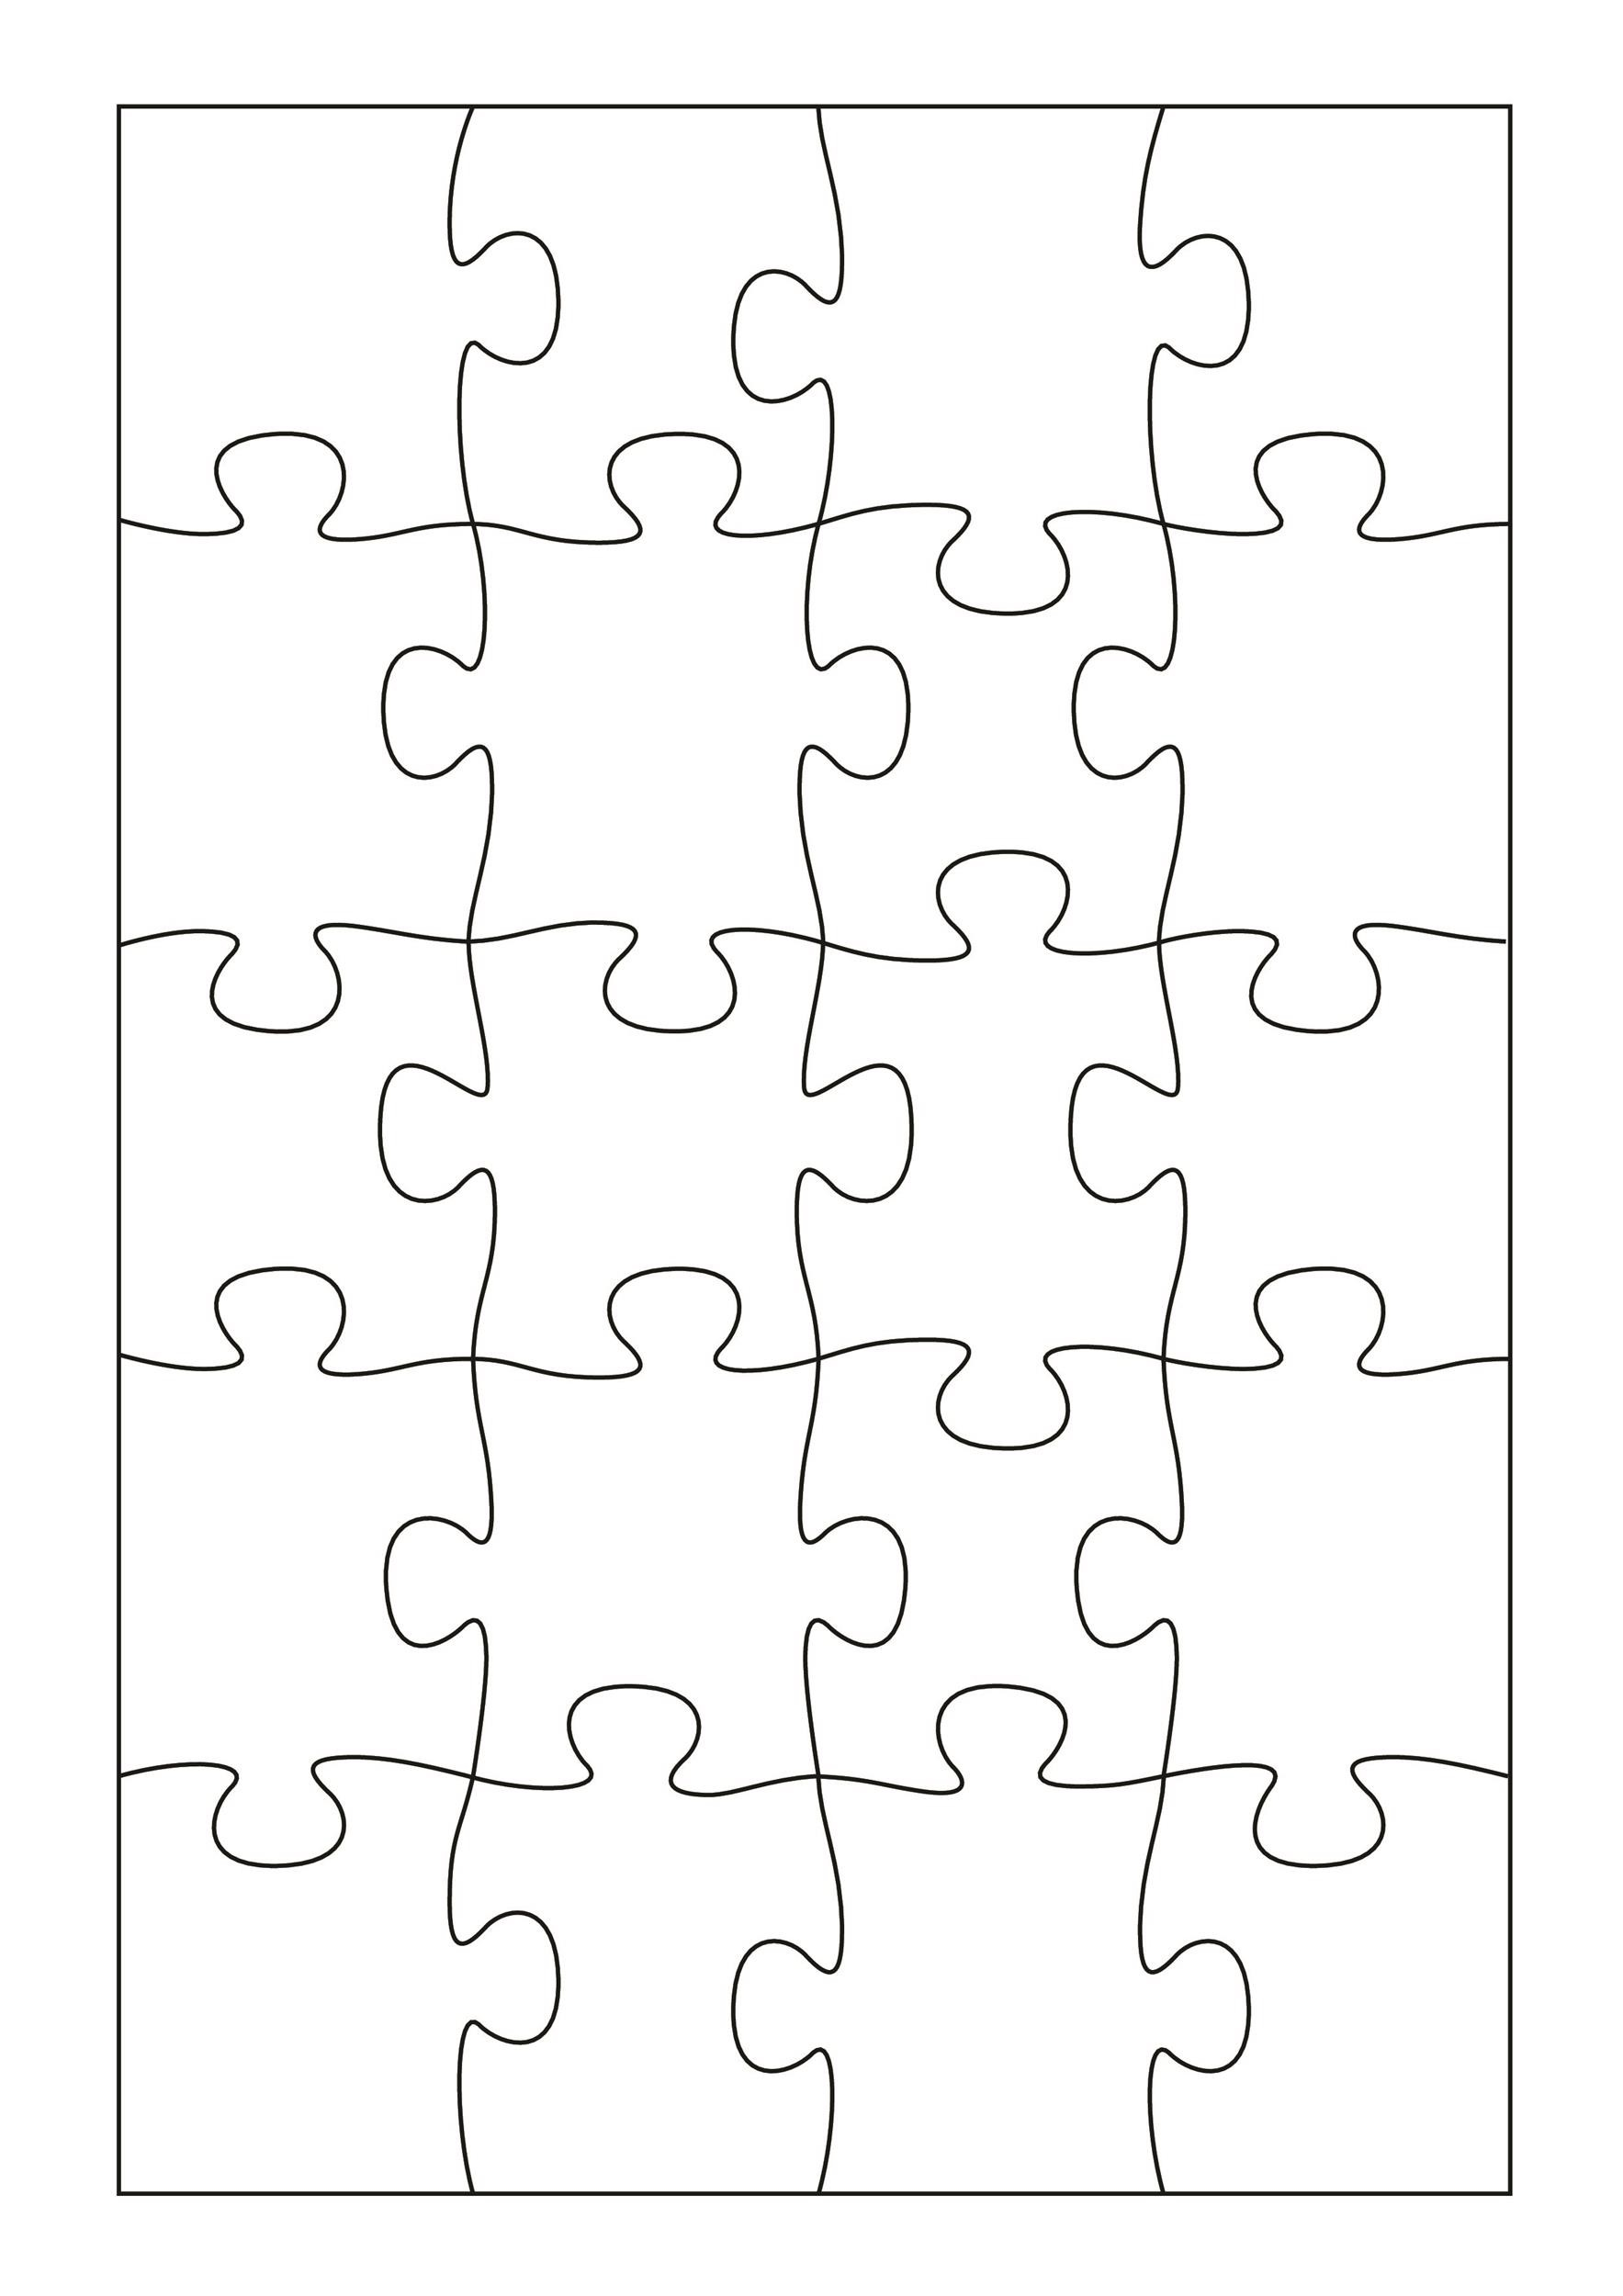 19 Printable Puzzle Piece Templates